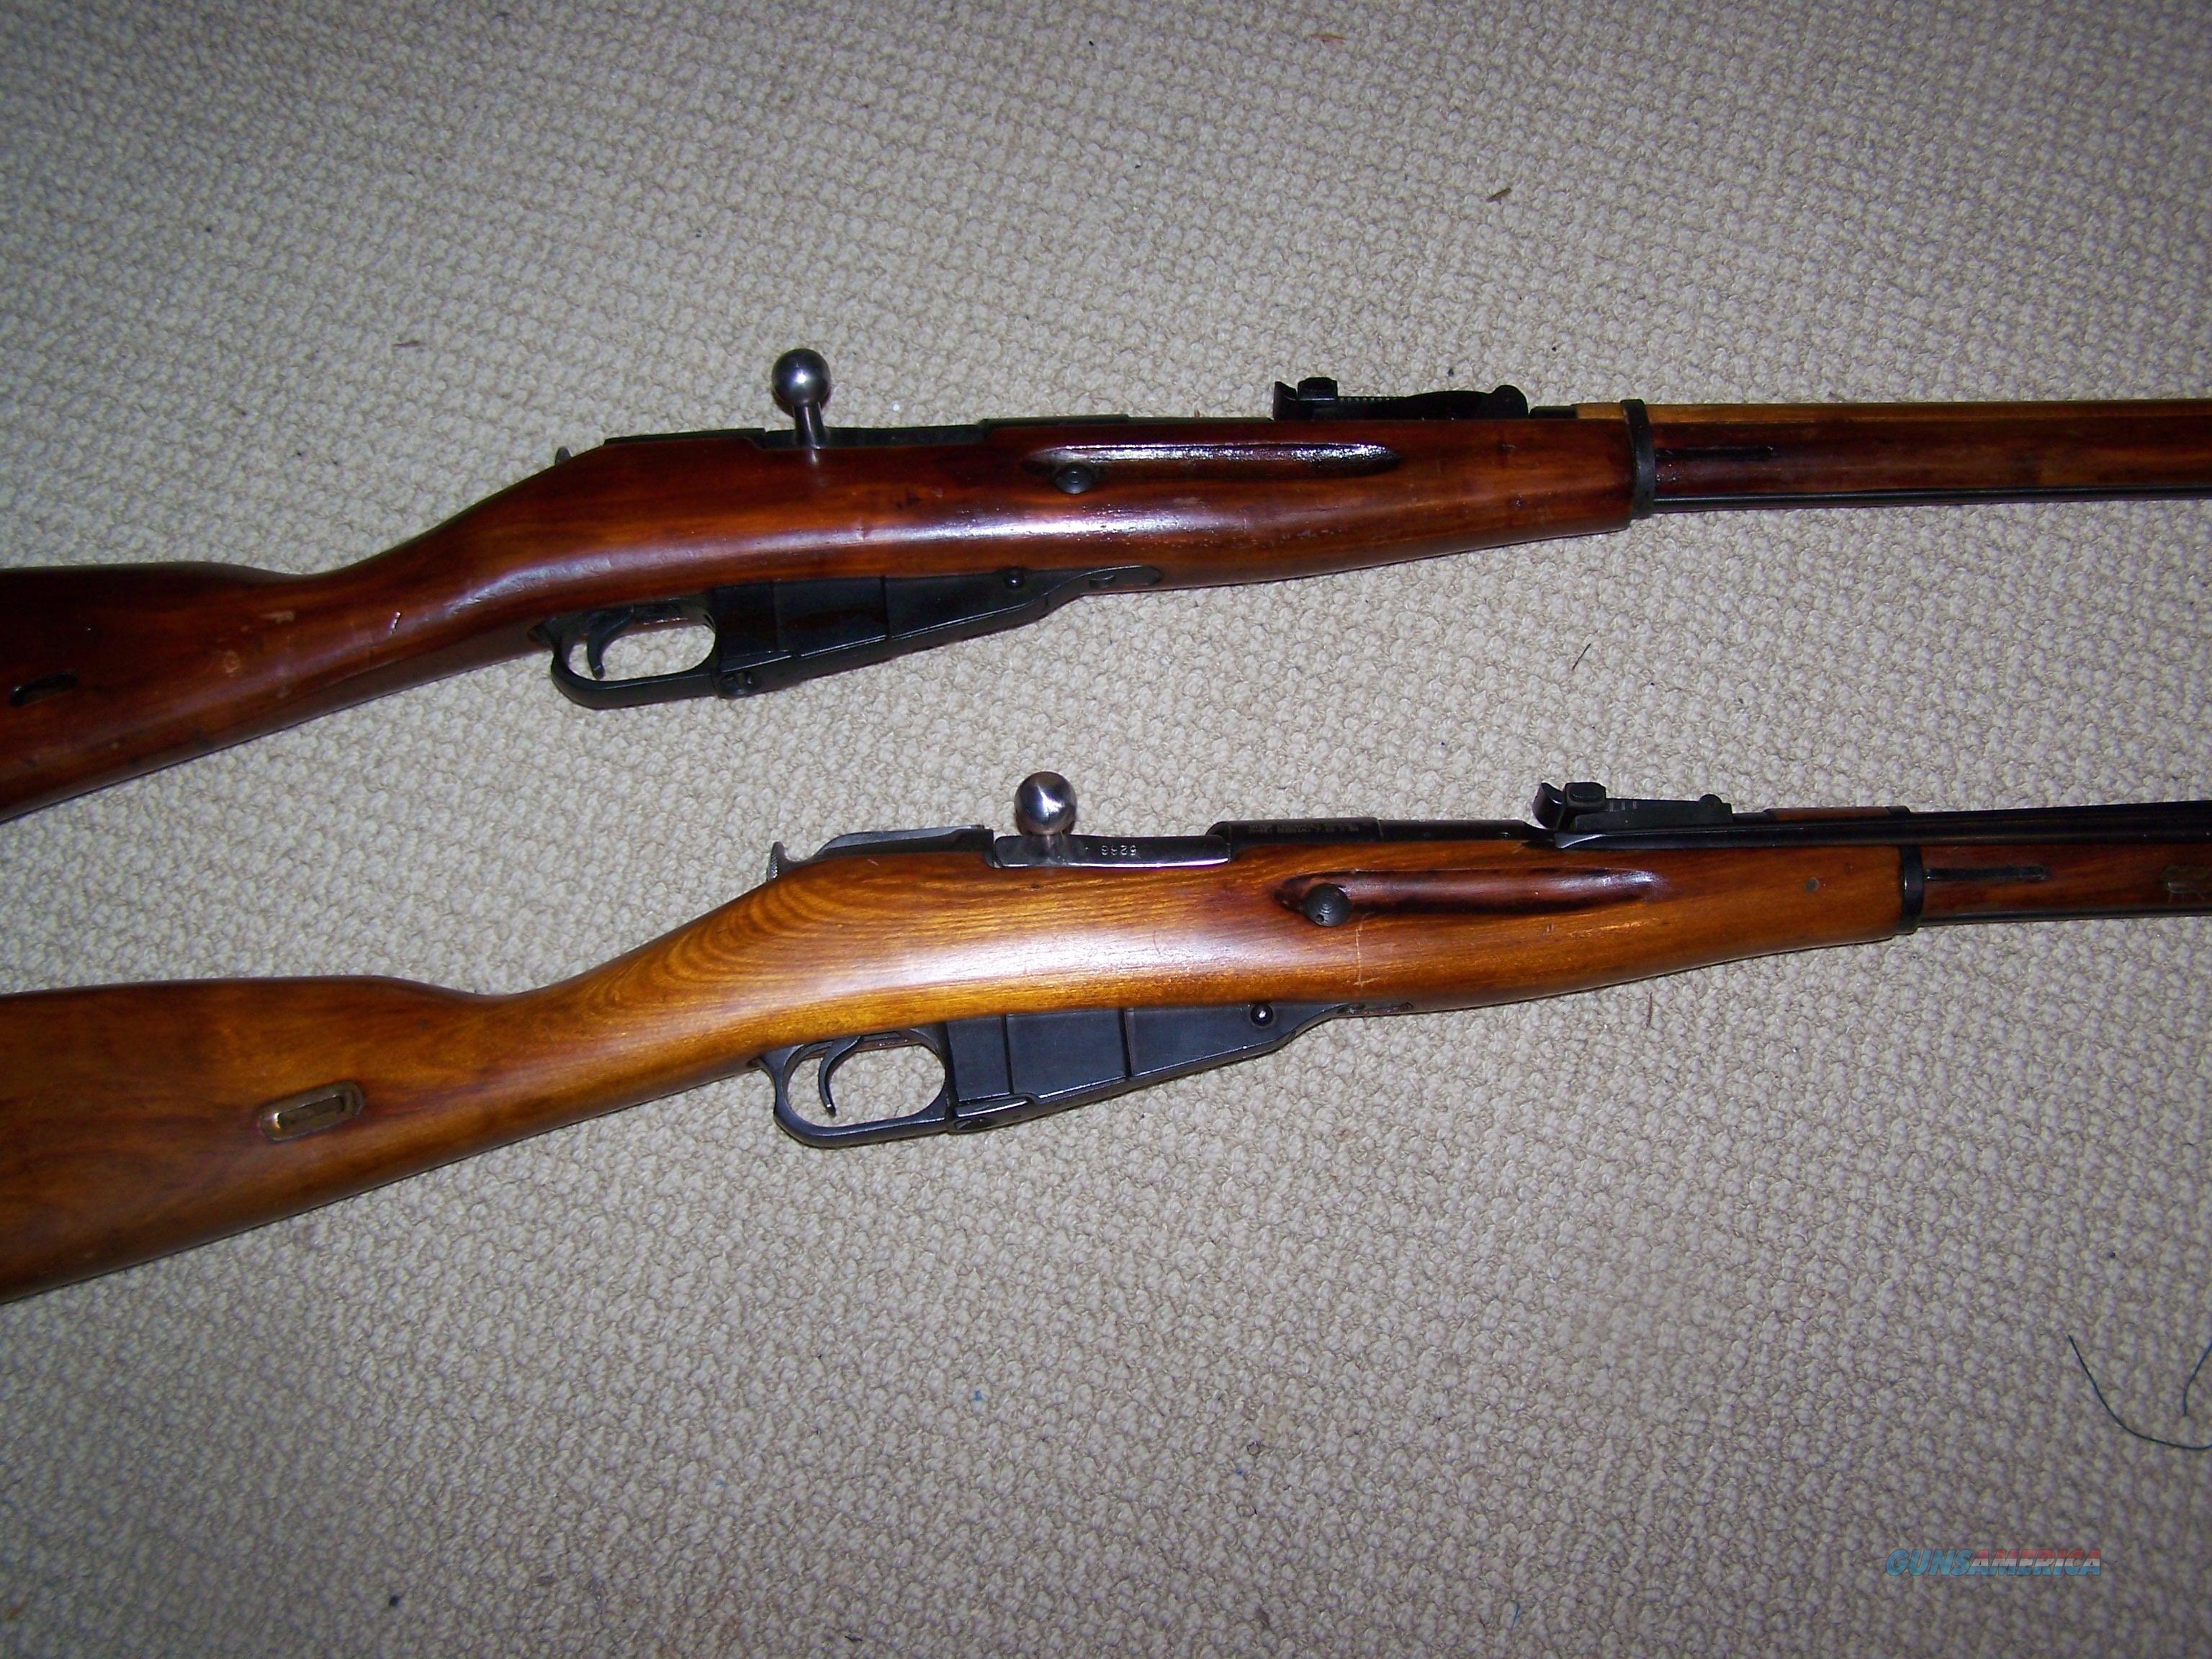 Mosin Nagant carbine 1948 mfg.  Guns > Rifles > Mosin-Nagant Rifles/Carbines